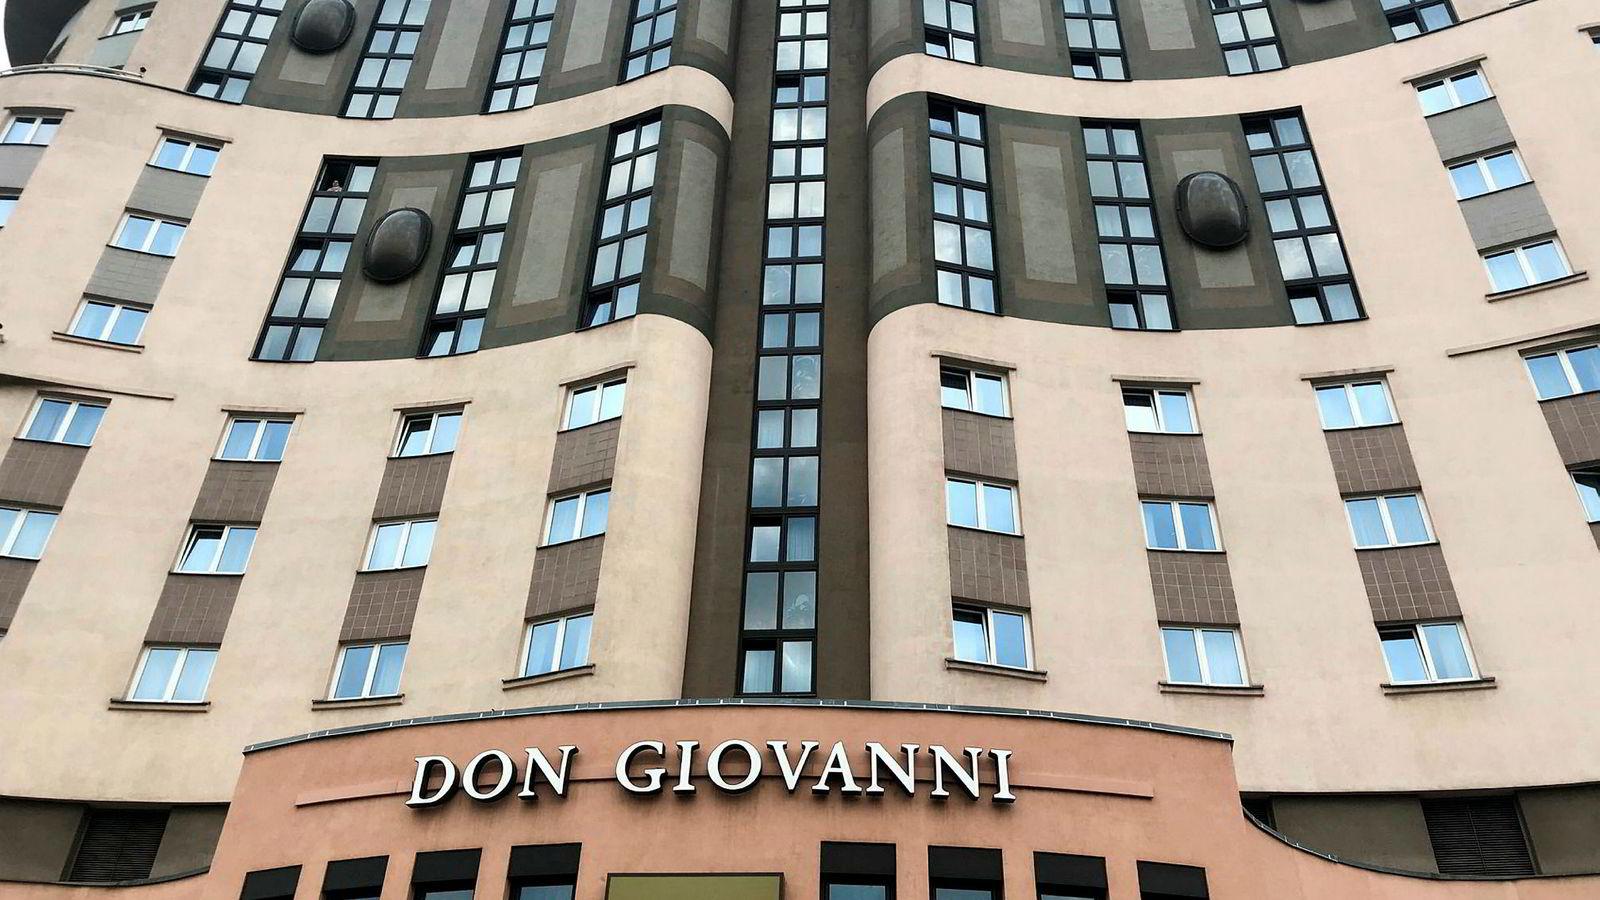 Don Giovanni Hotel i Tsjekkias hovedstad Praha er et firestjerners hotell.